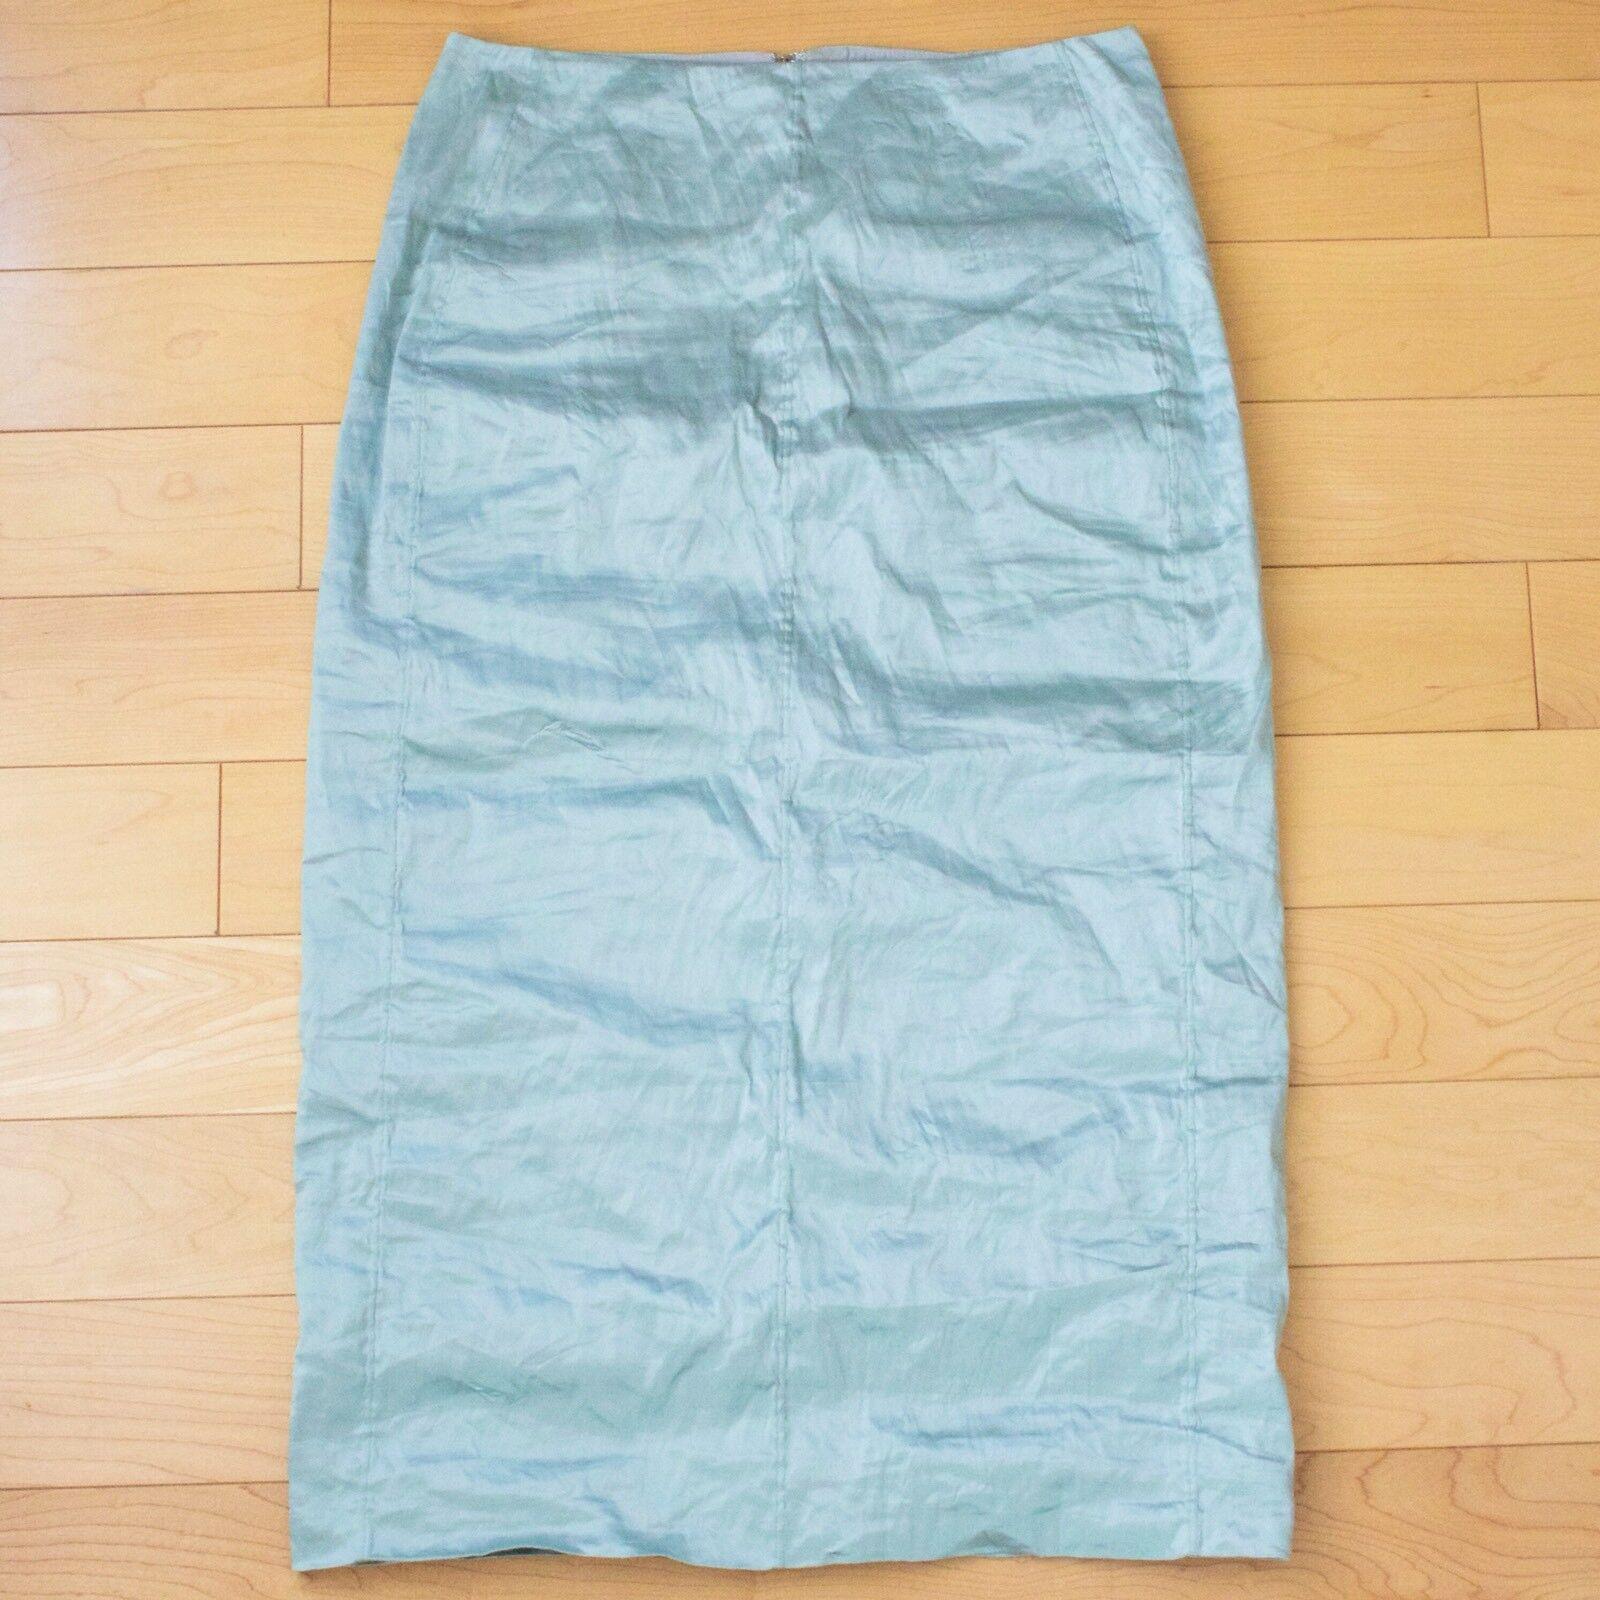 Carven - Sz 38 - Crinkle Taffeta Pencil Skirt - Jade